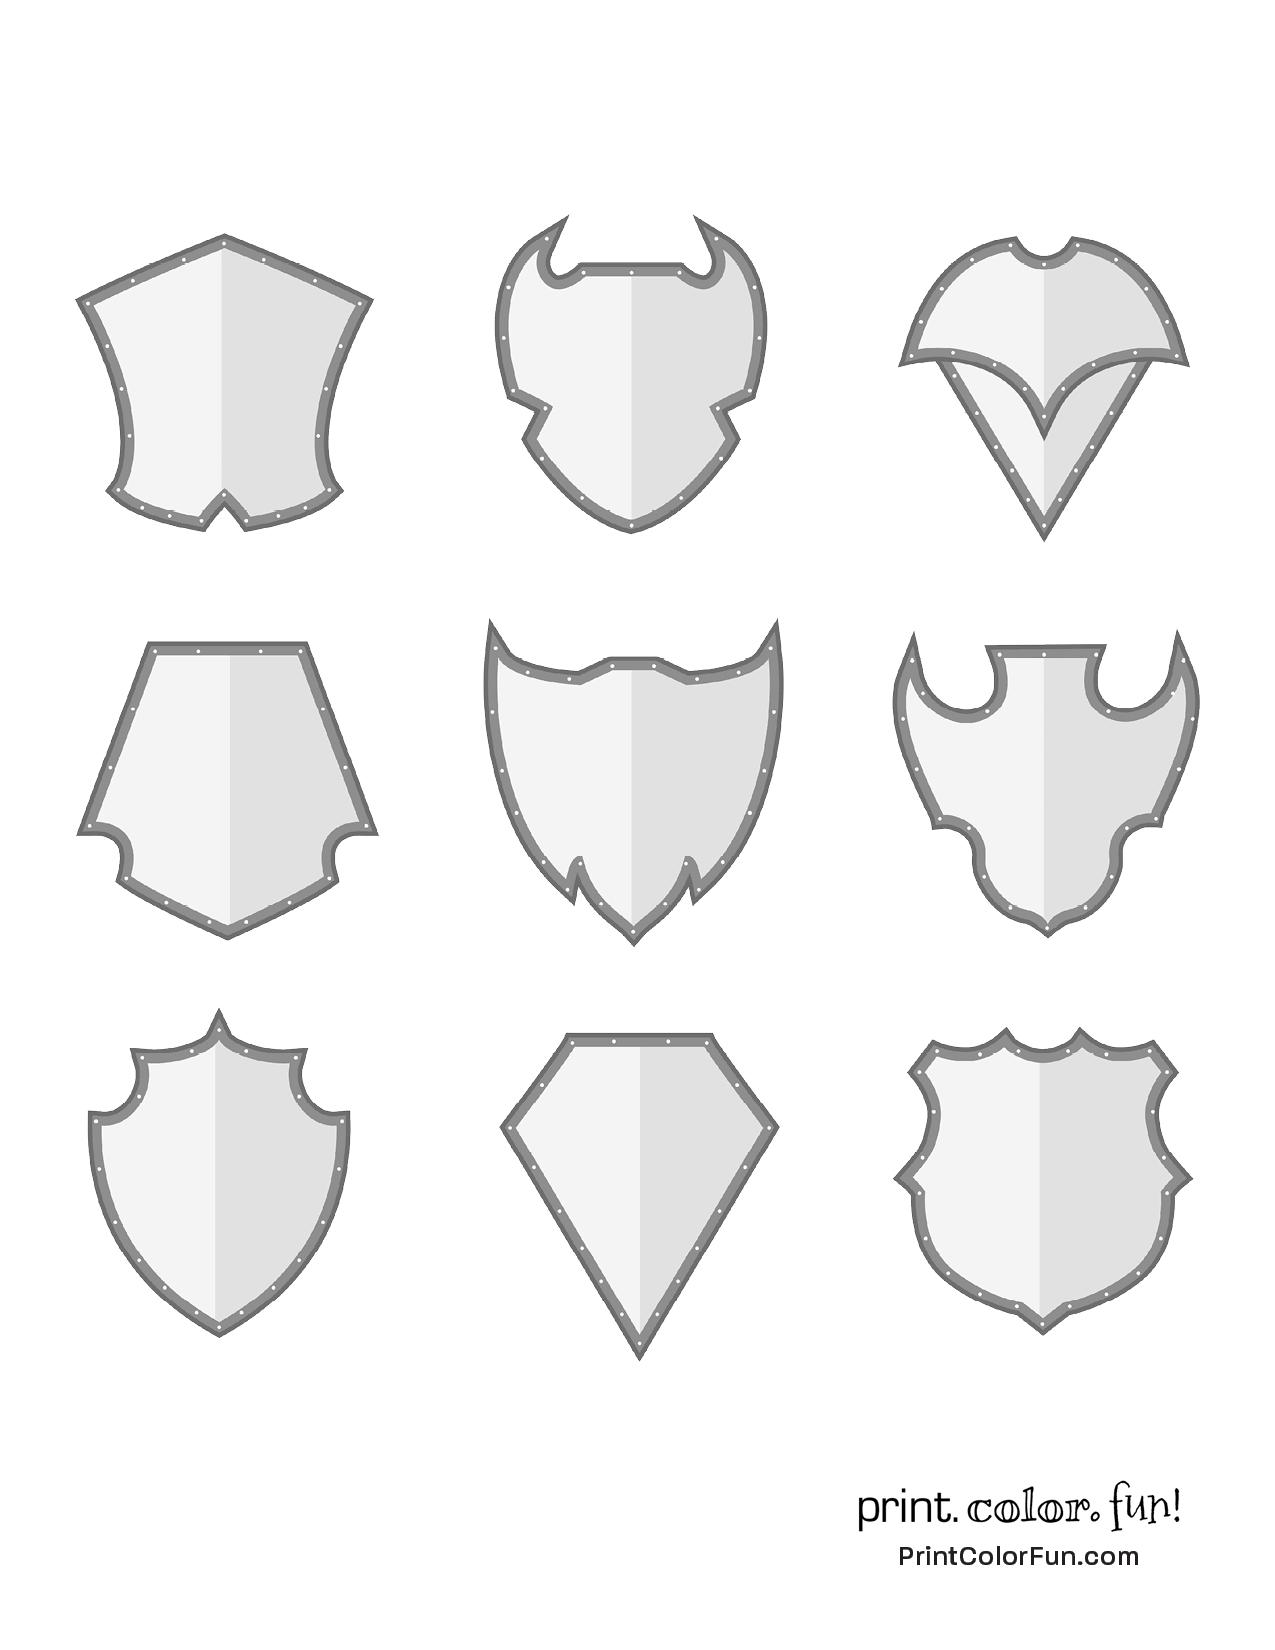 Set of shaded shields